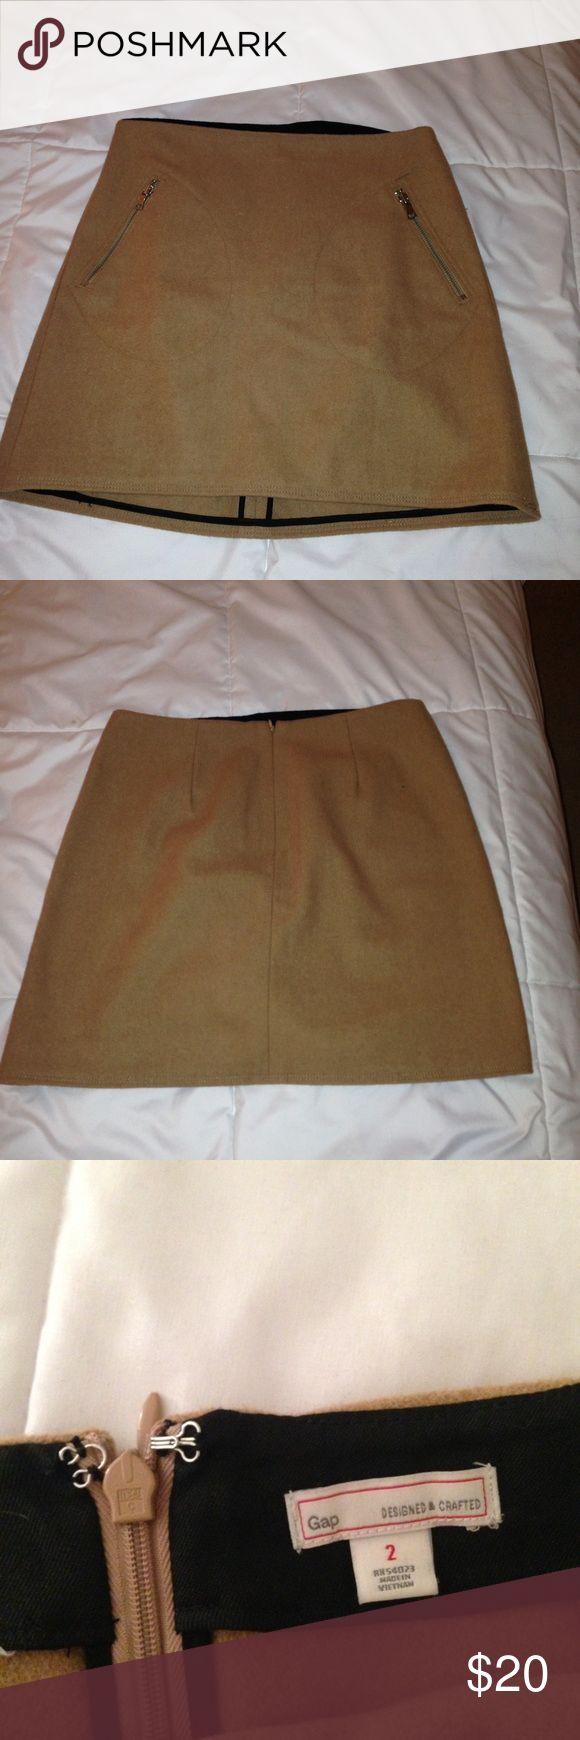 Gap knit skirt worn once. gap skirt GAP Skirts